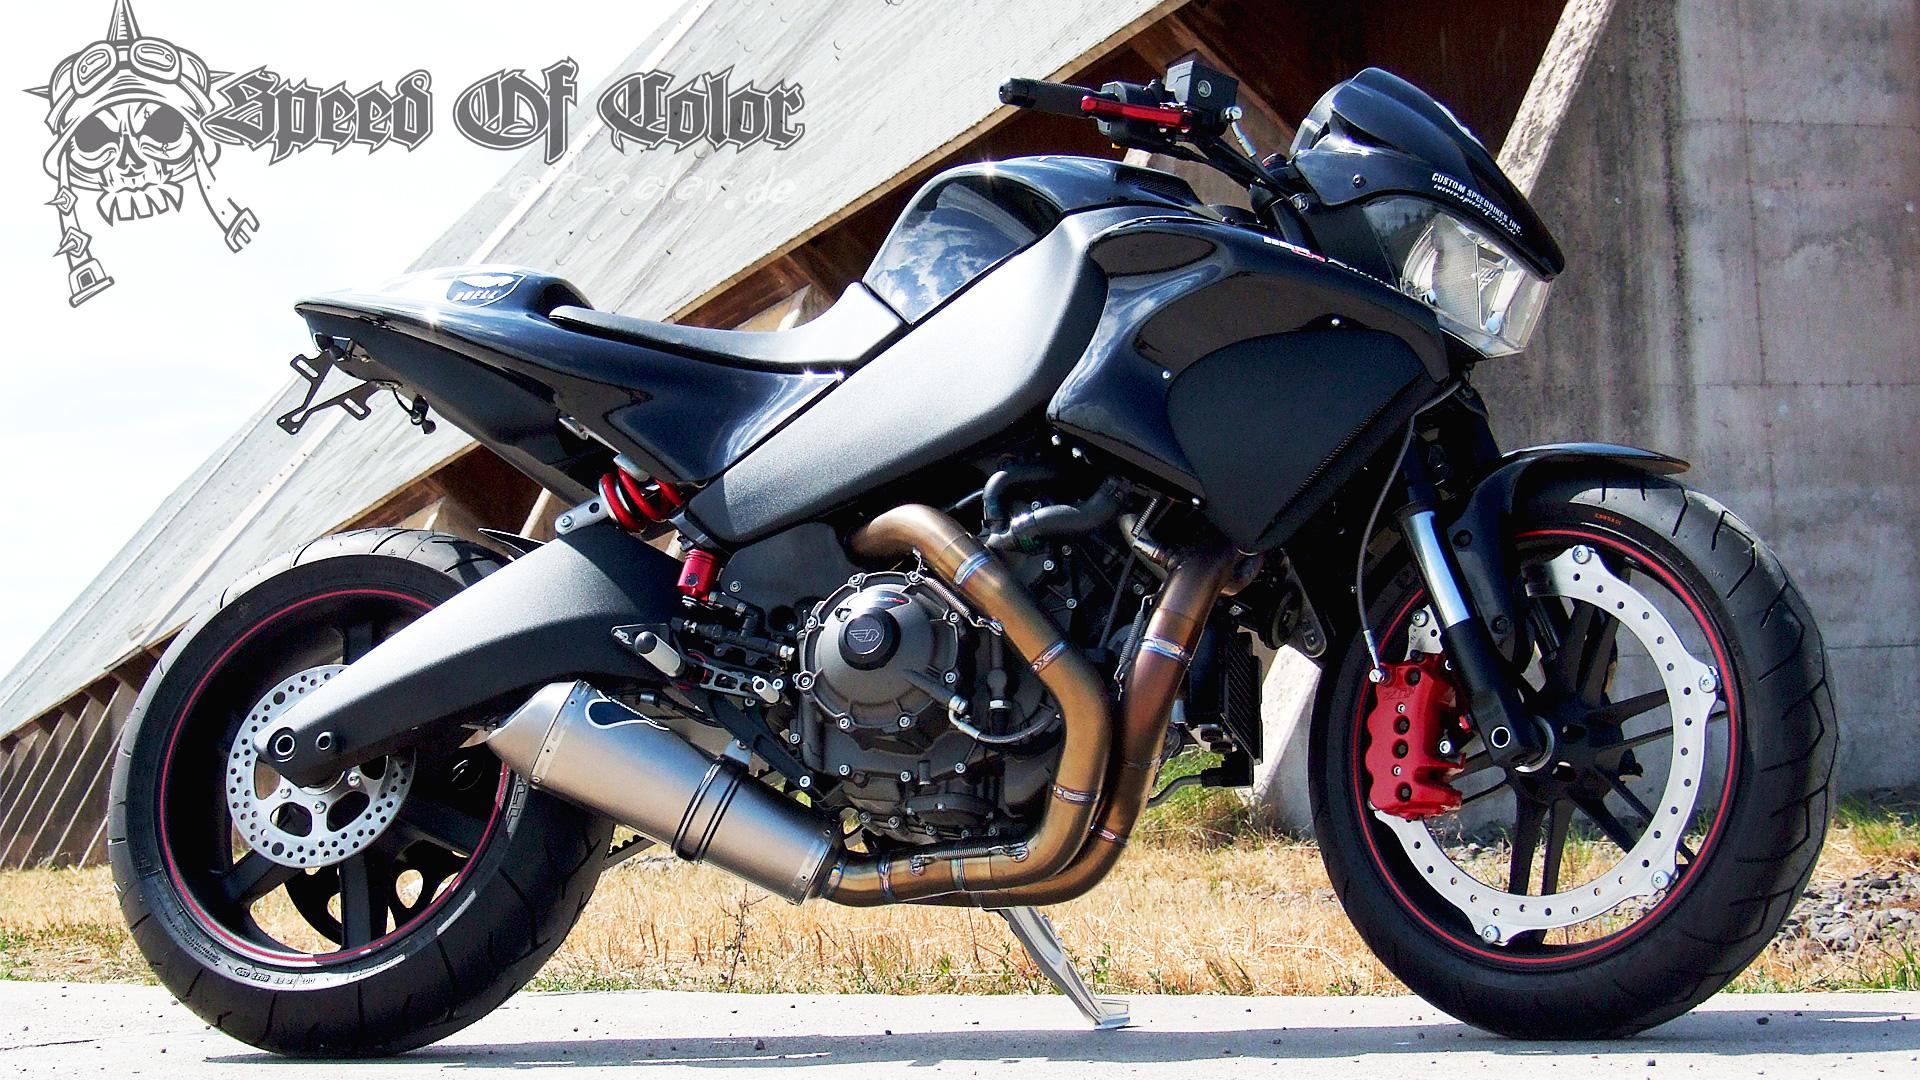 Ducati Engineering